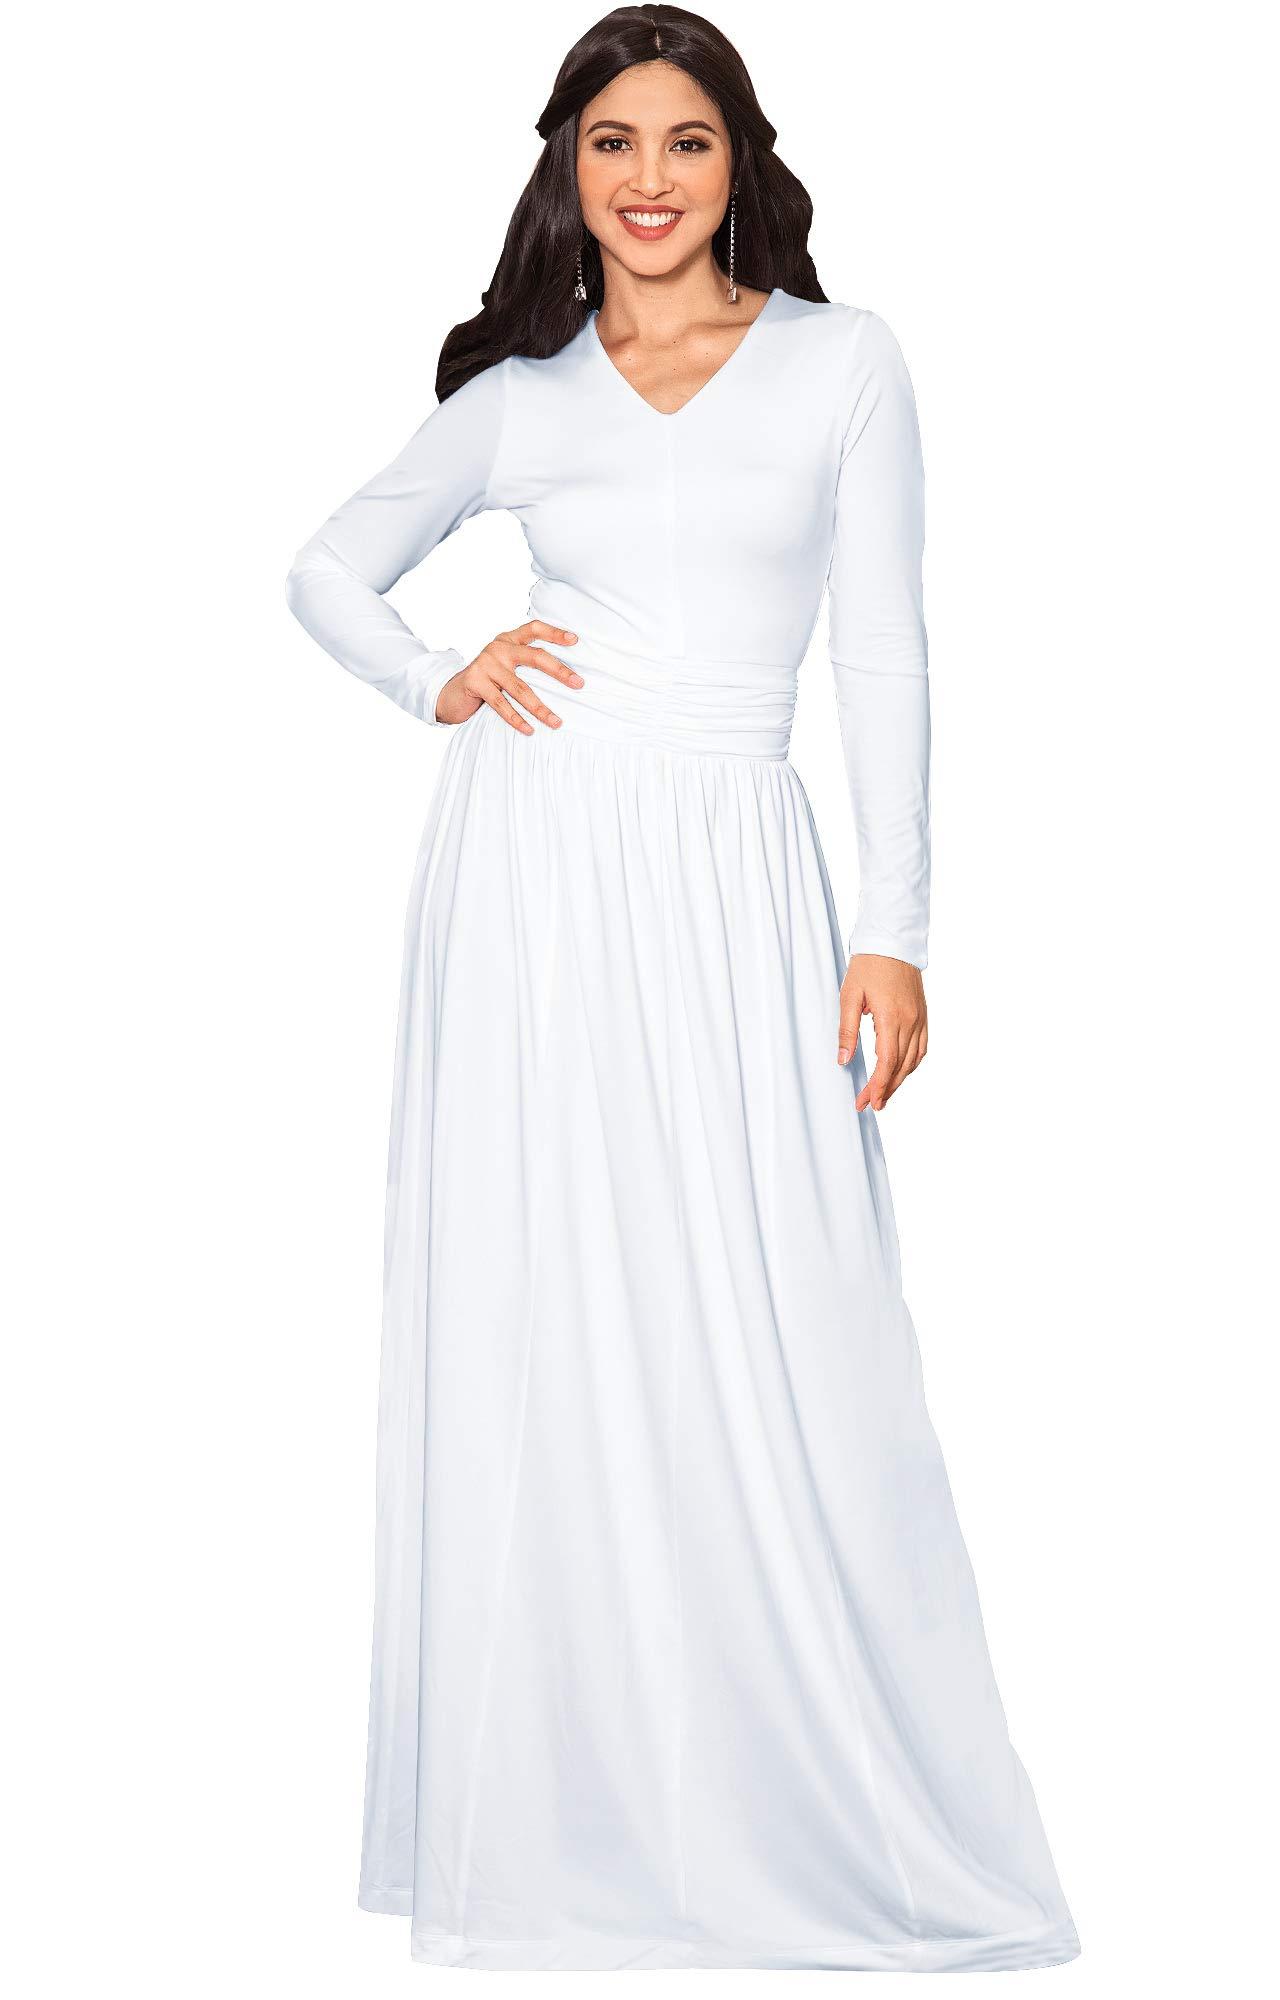 8b9e53a1cec23 KOH KOH Womens Long Sleeve Floor Full Length V-Neck Ruched Empire Waist Formal  Fall Winter Wedding Abaya Modest Muslim Evening Gown Gowns Maxi Dress  Dresses ...